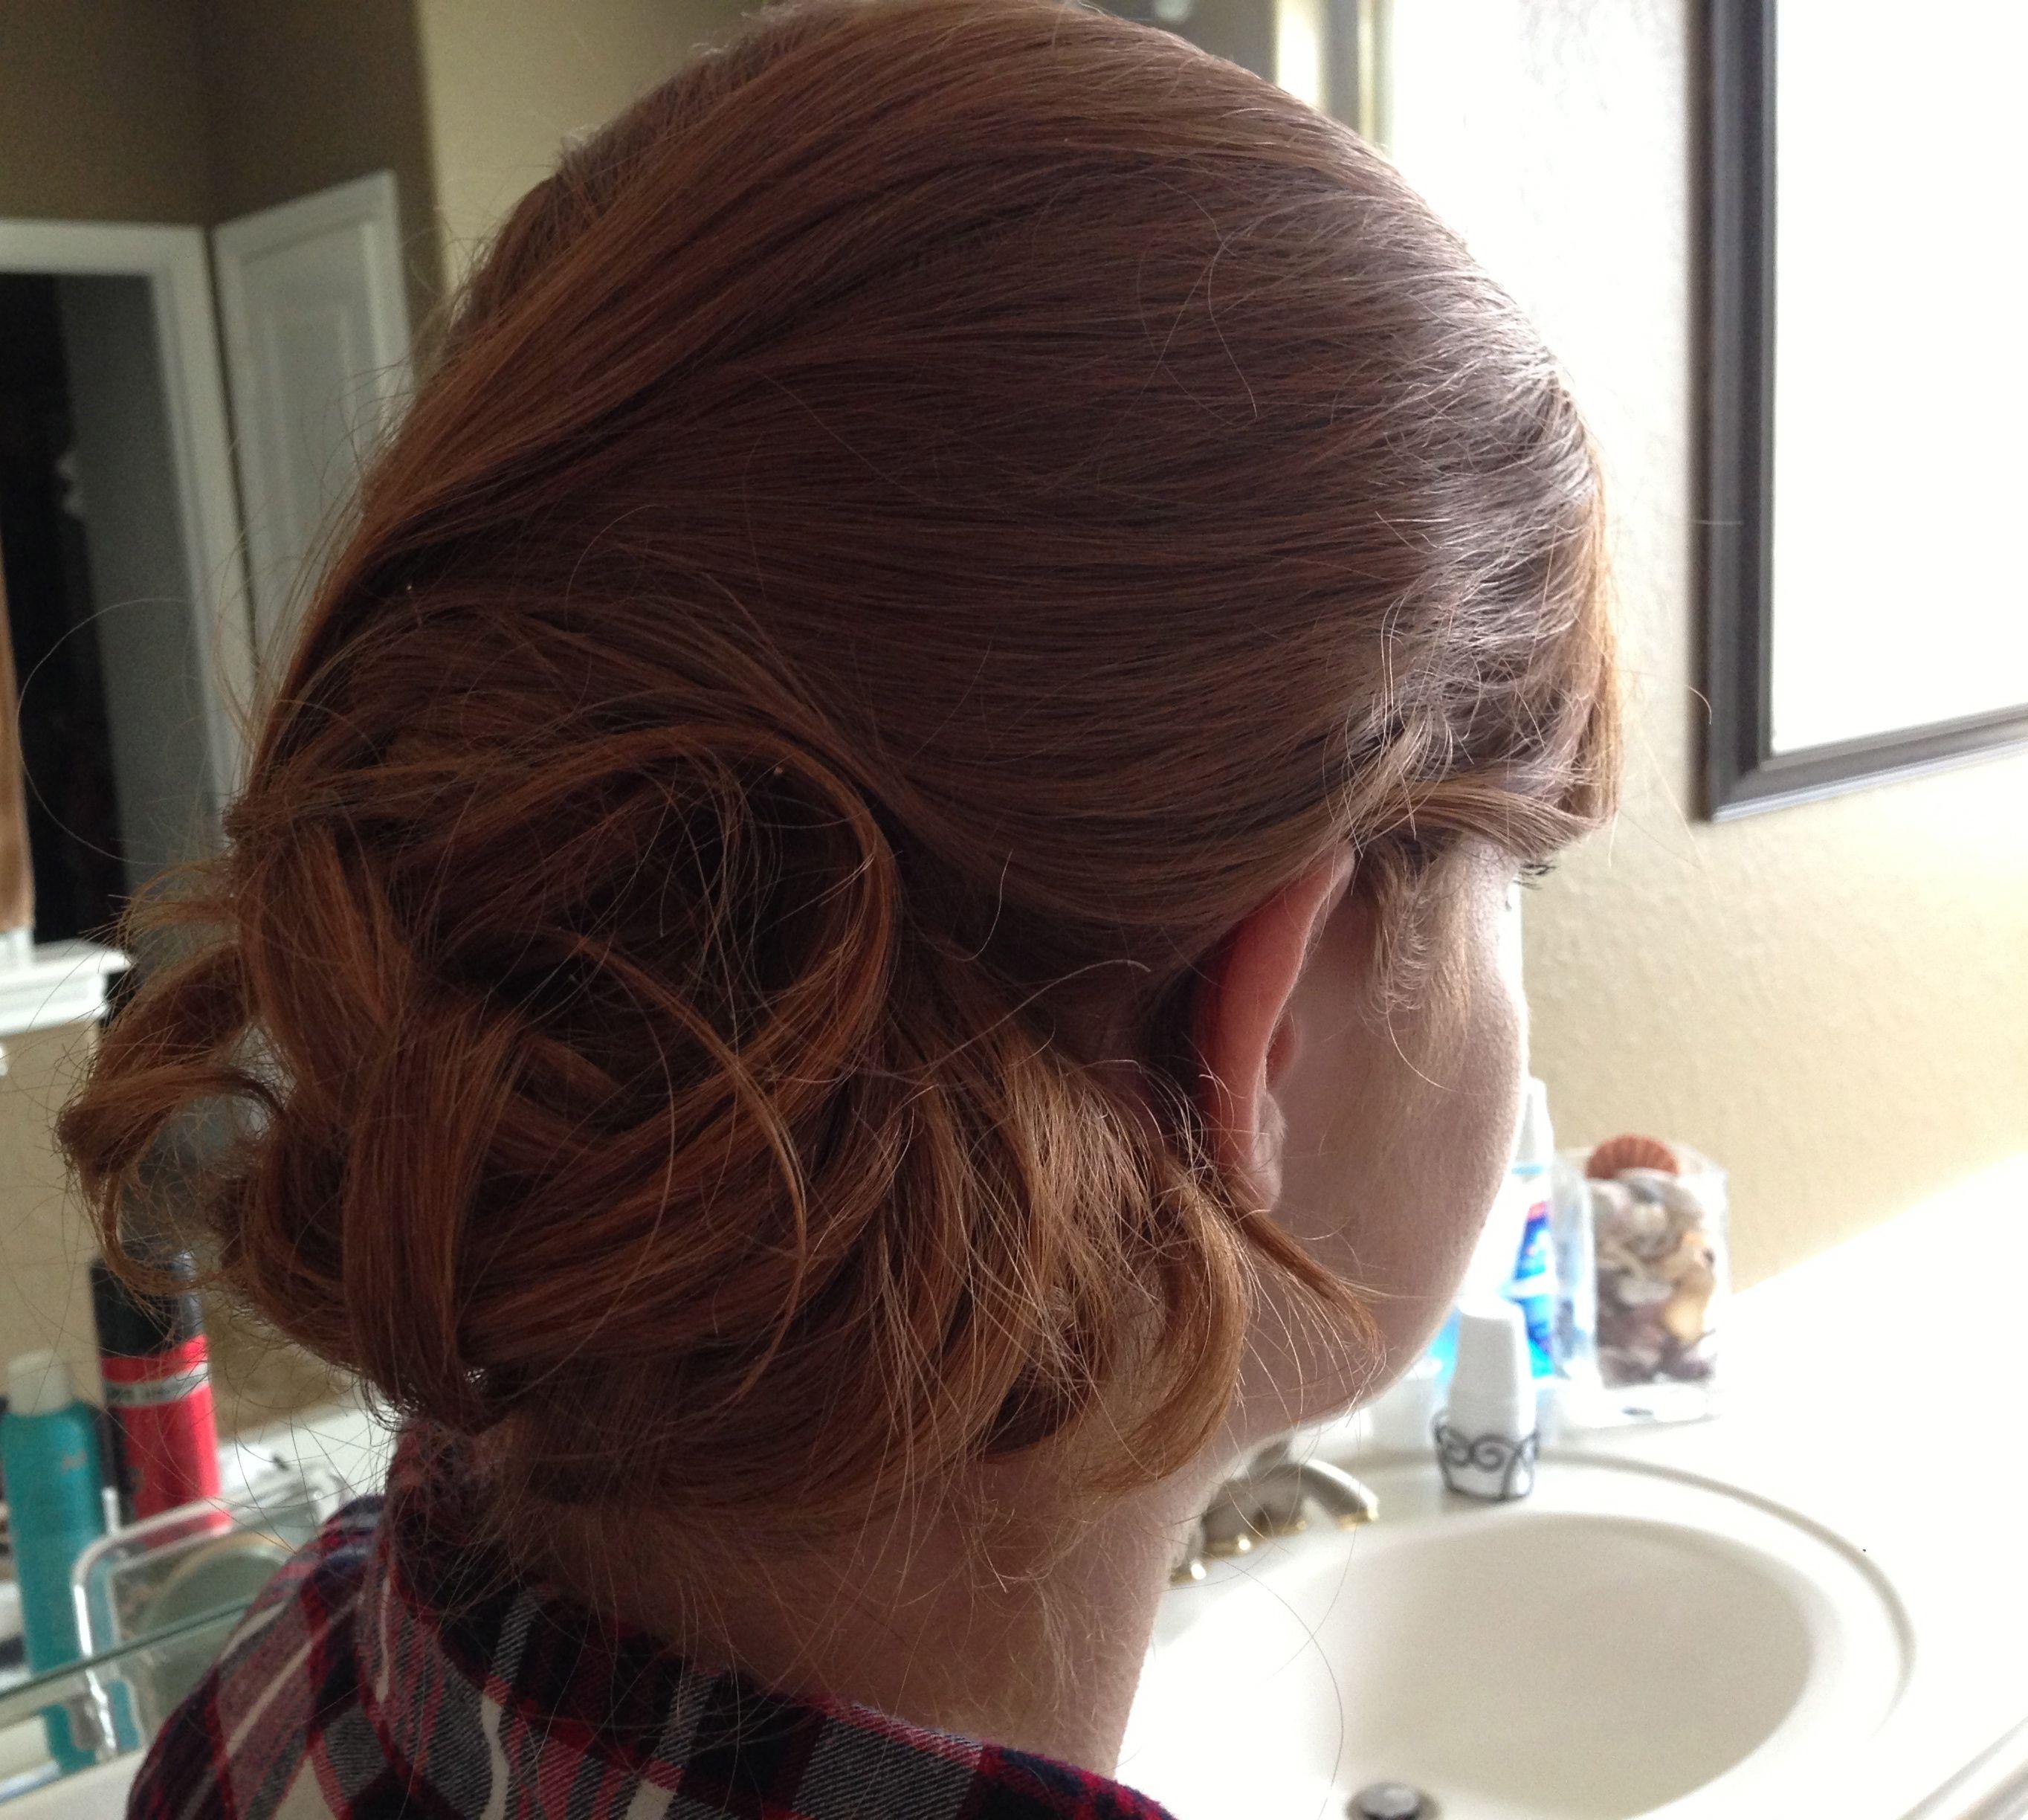 Homecoming hair...messy bun